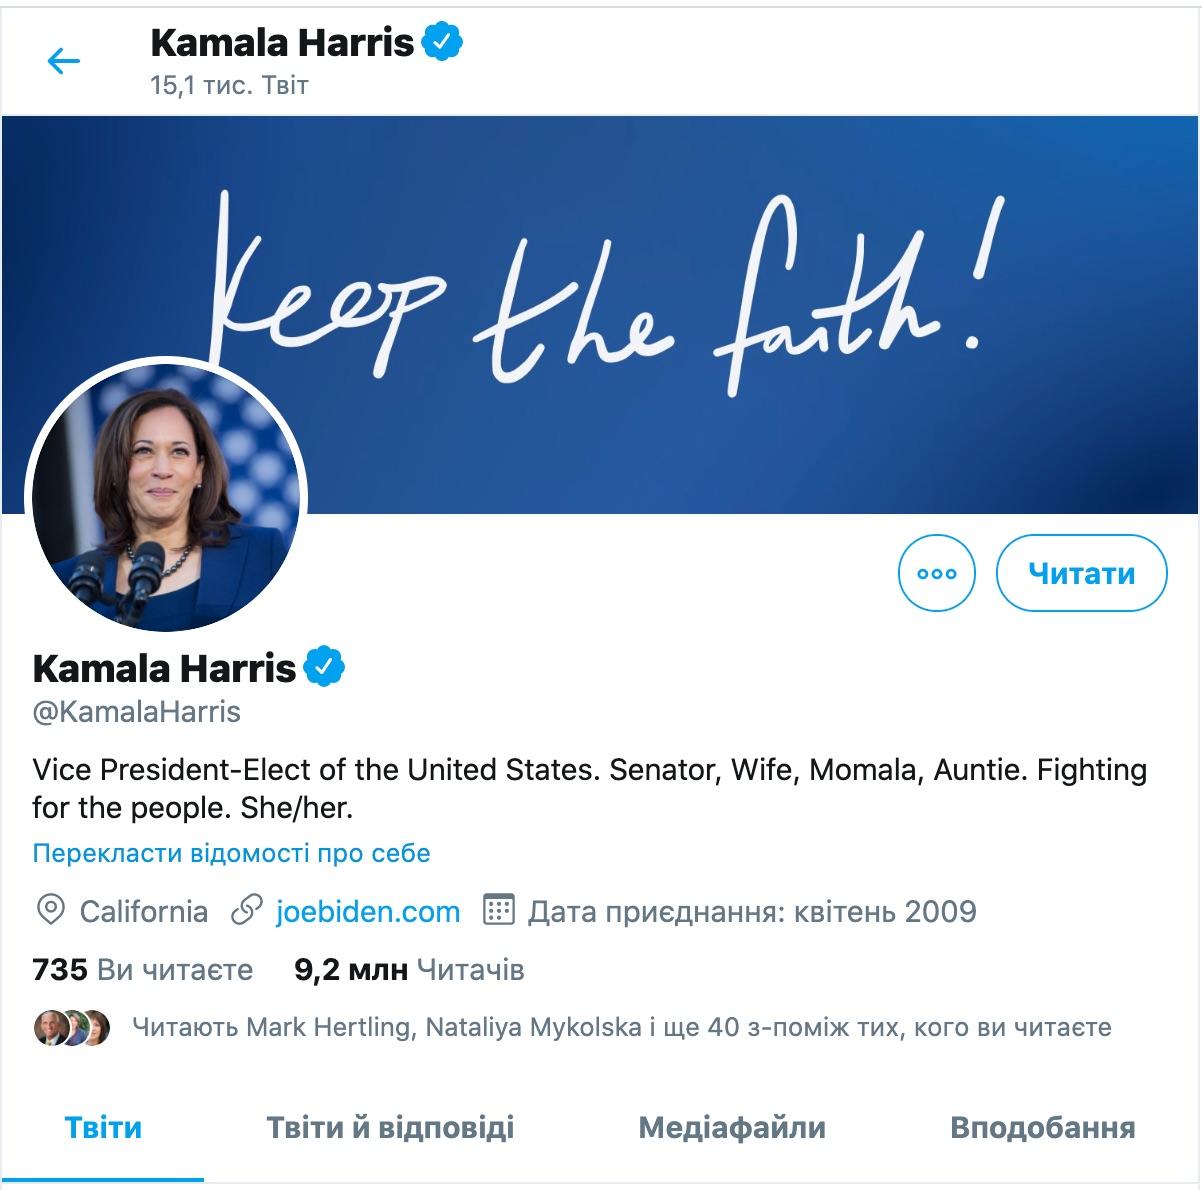 Скриншот Twitter-страницы Камалы Харрис